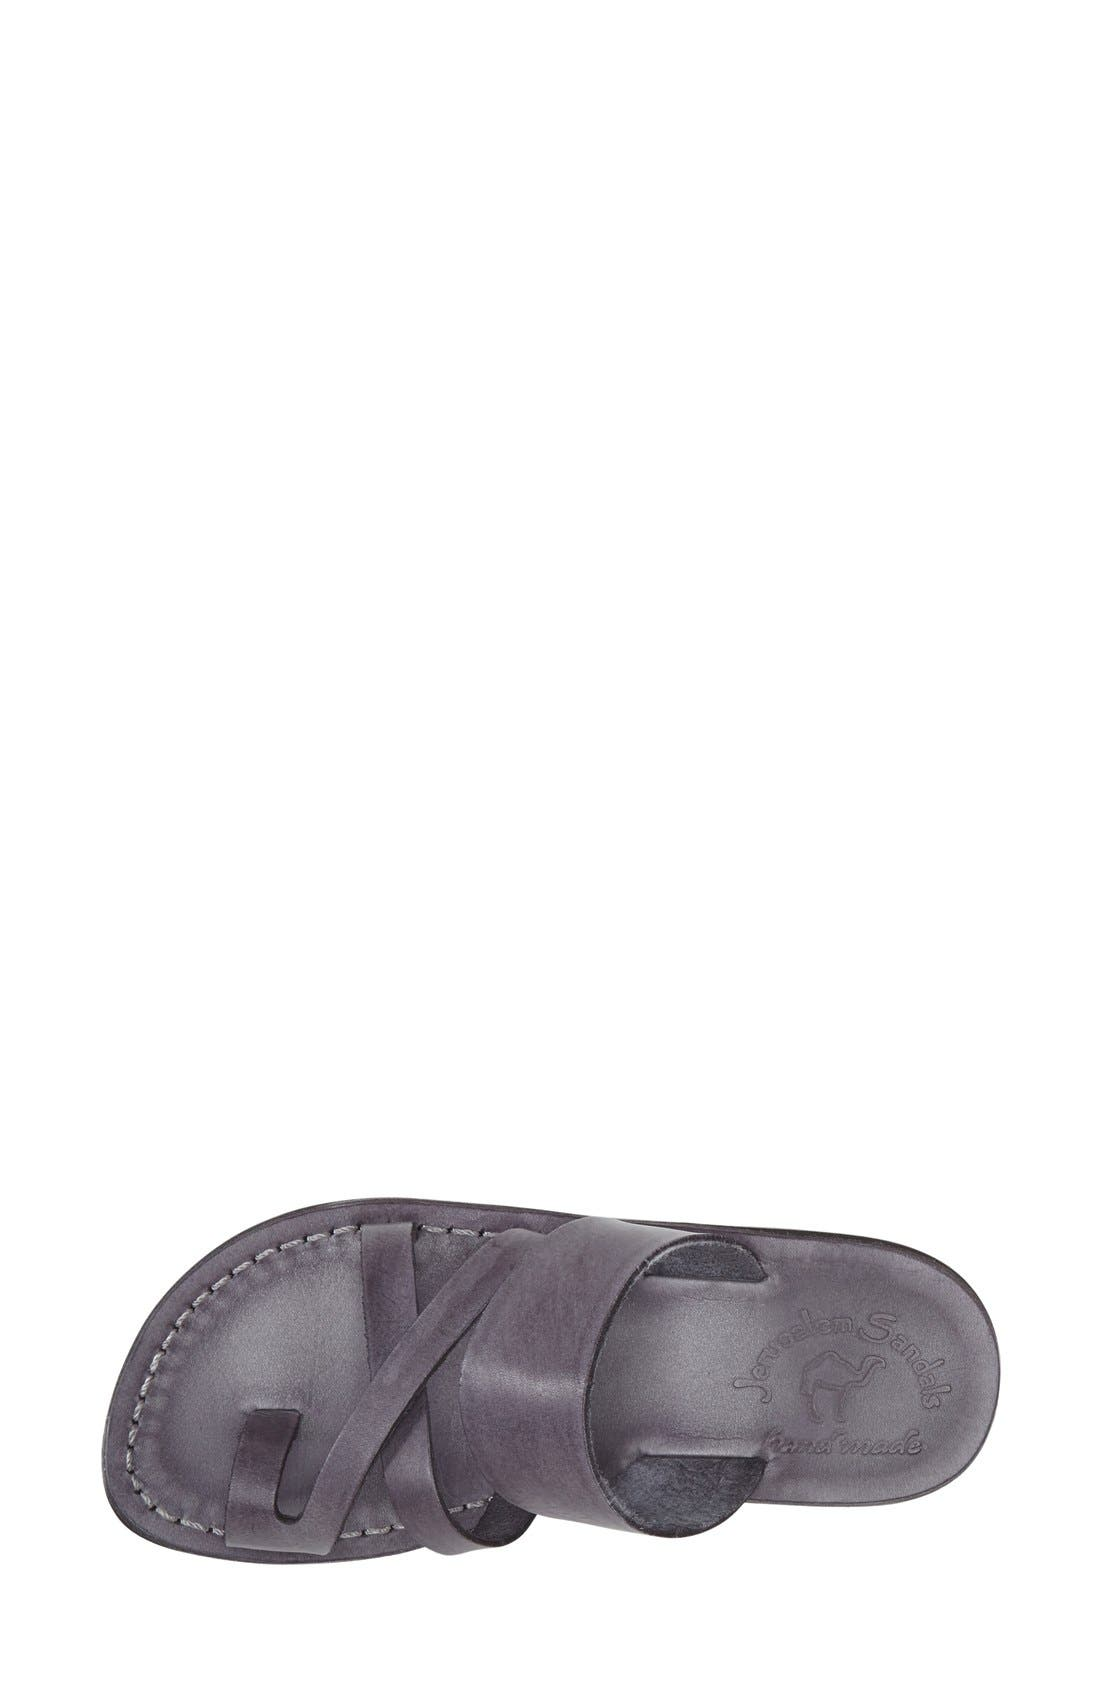 'The Good Shepard' Leather Sandal,                             Alternate thumbnail 11, color,